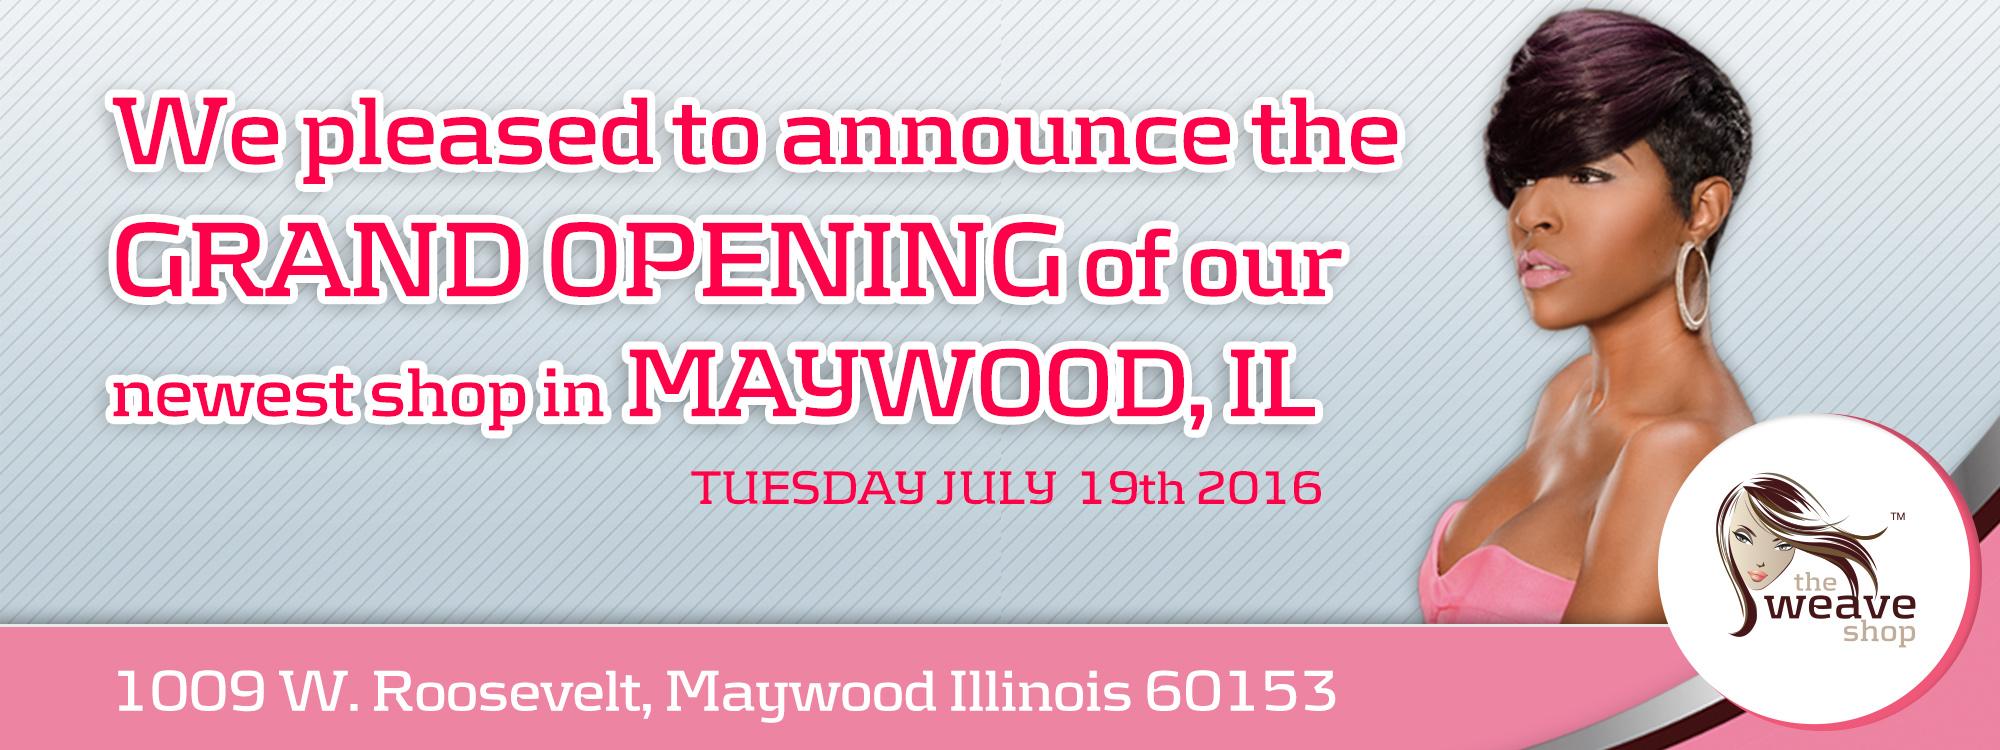 maywood_grand_opening